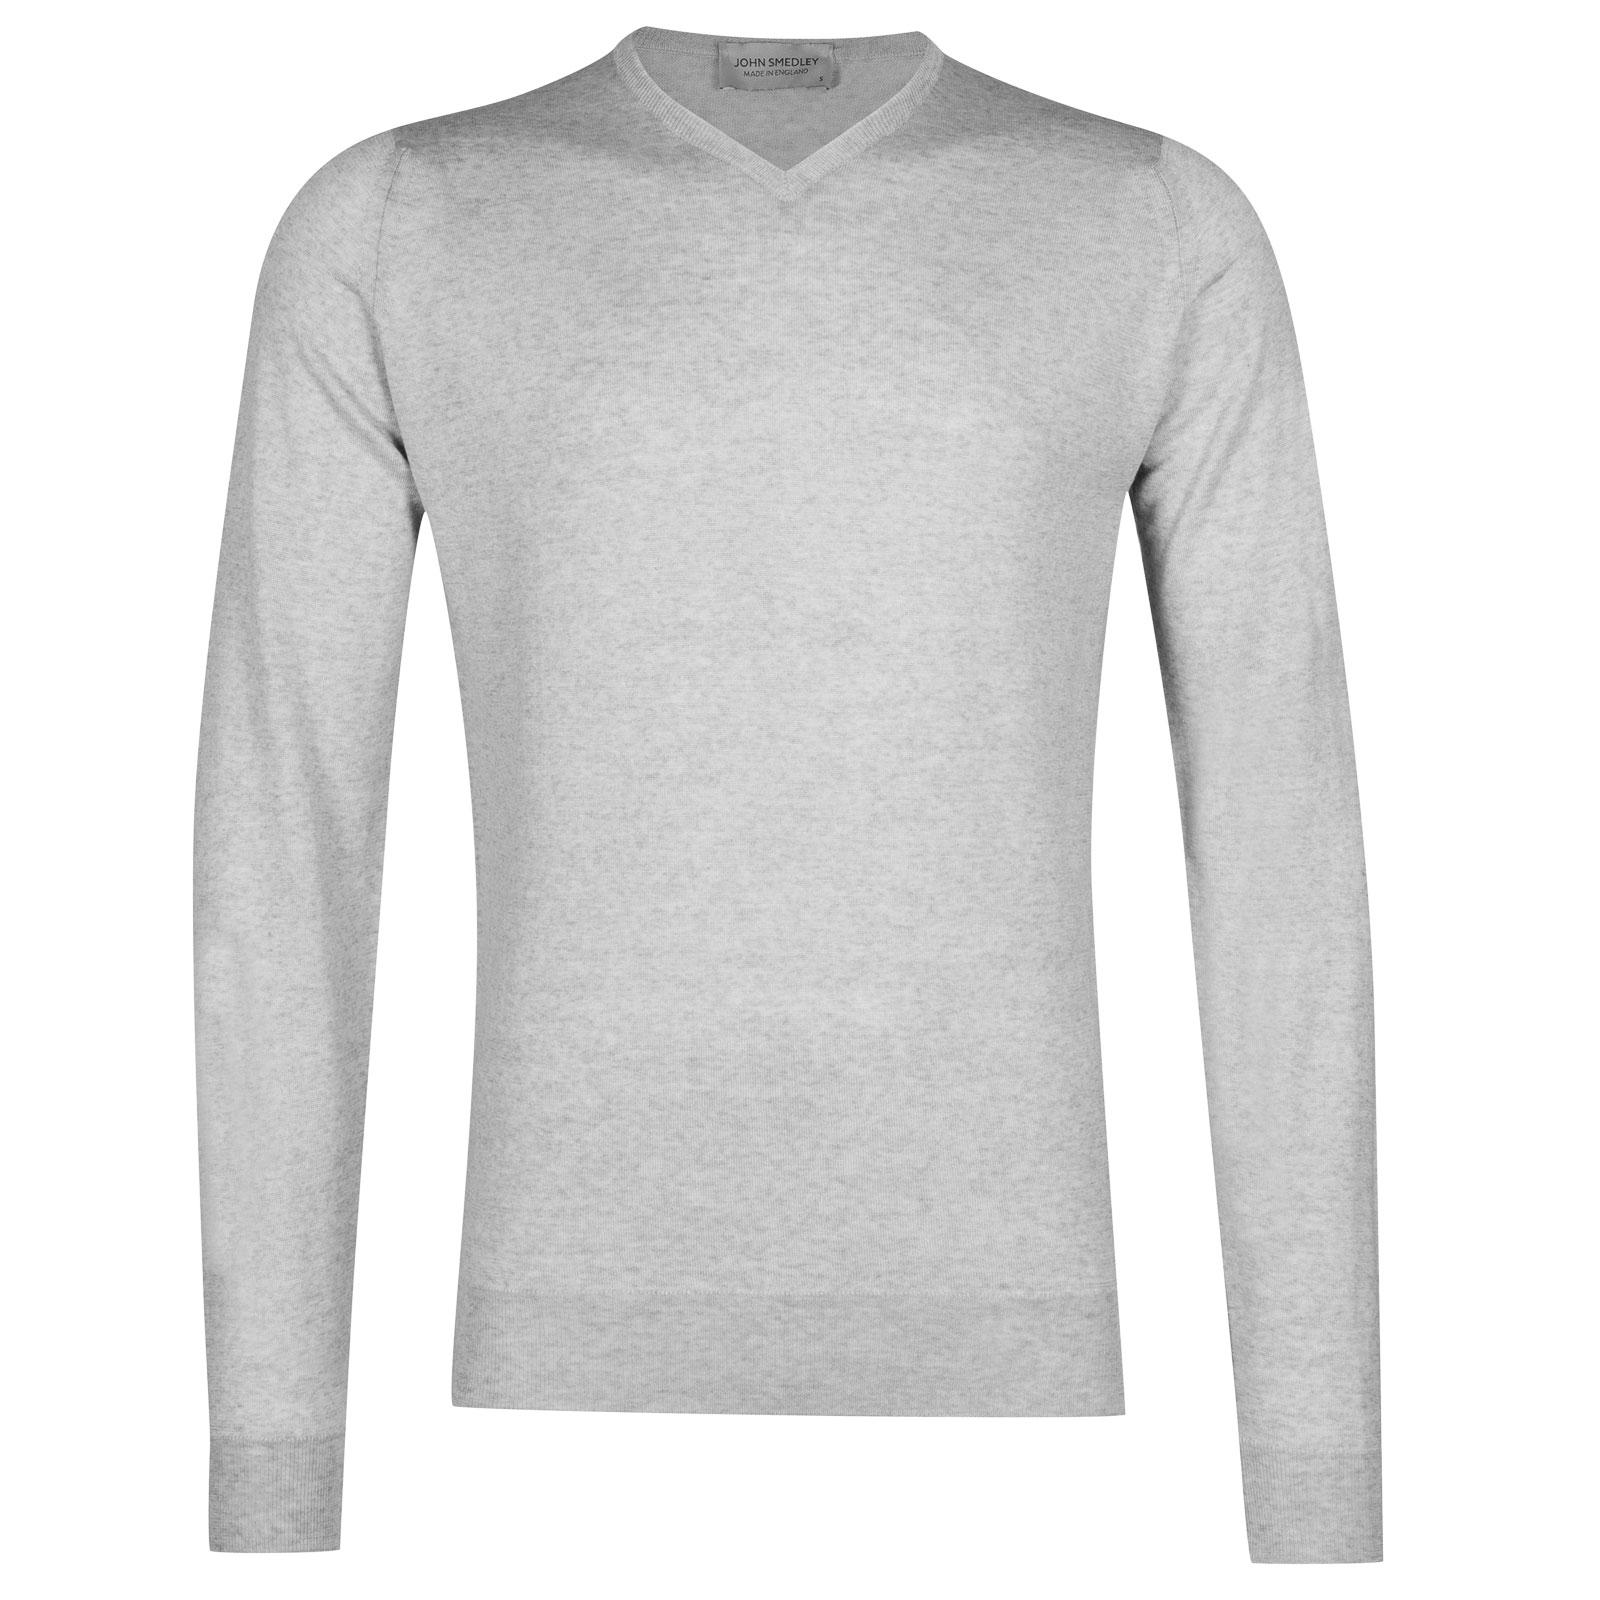 John Smedley shipton Merino Wool Pullover in Bardot Grey-S